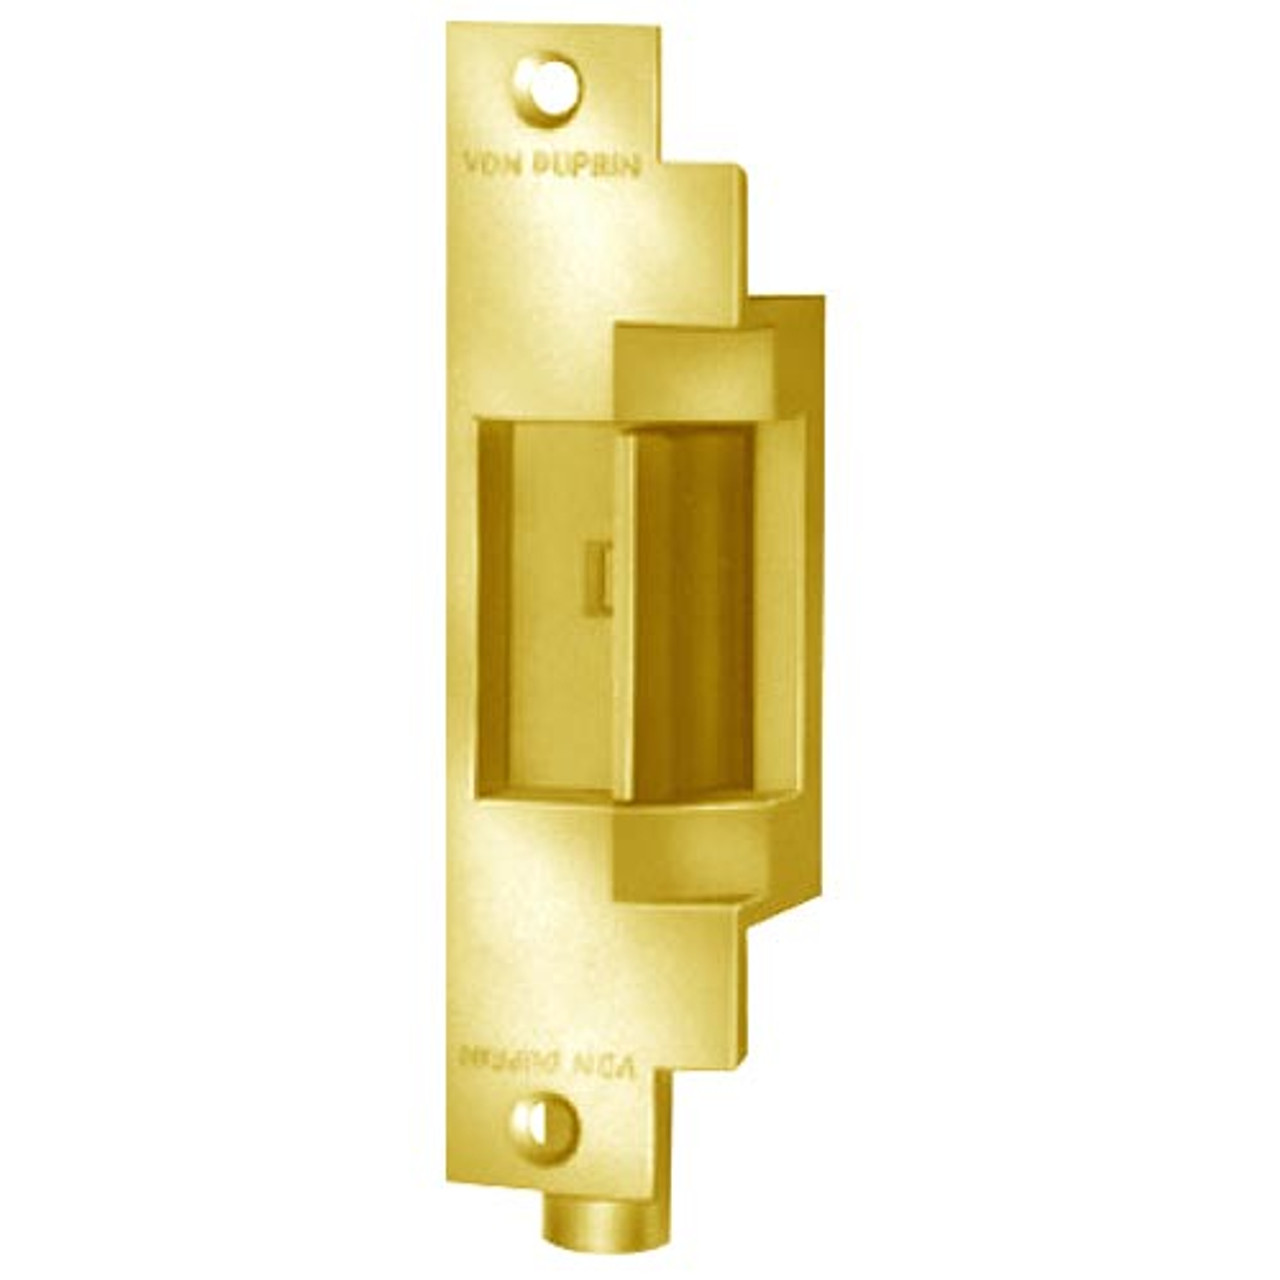 6212-DS-12VDC-US3 Von Duprin Electric Strike in Bright Brass Finish